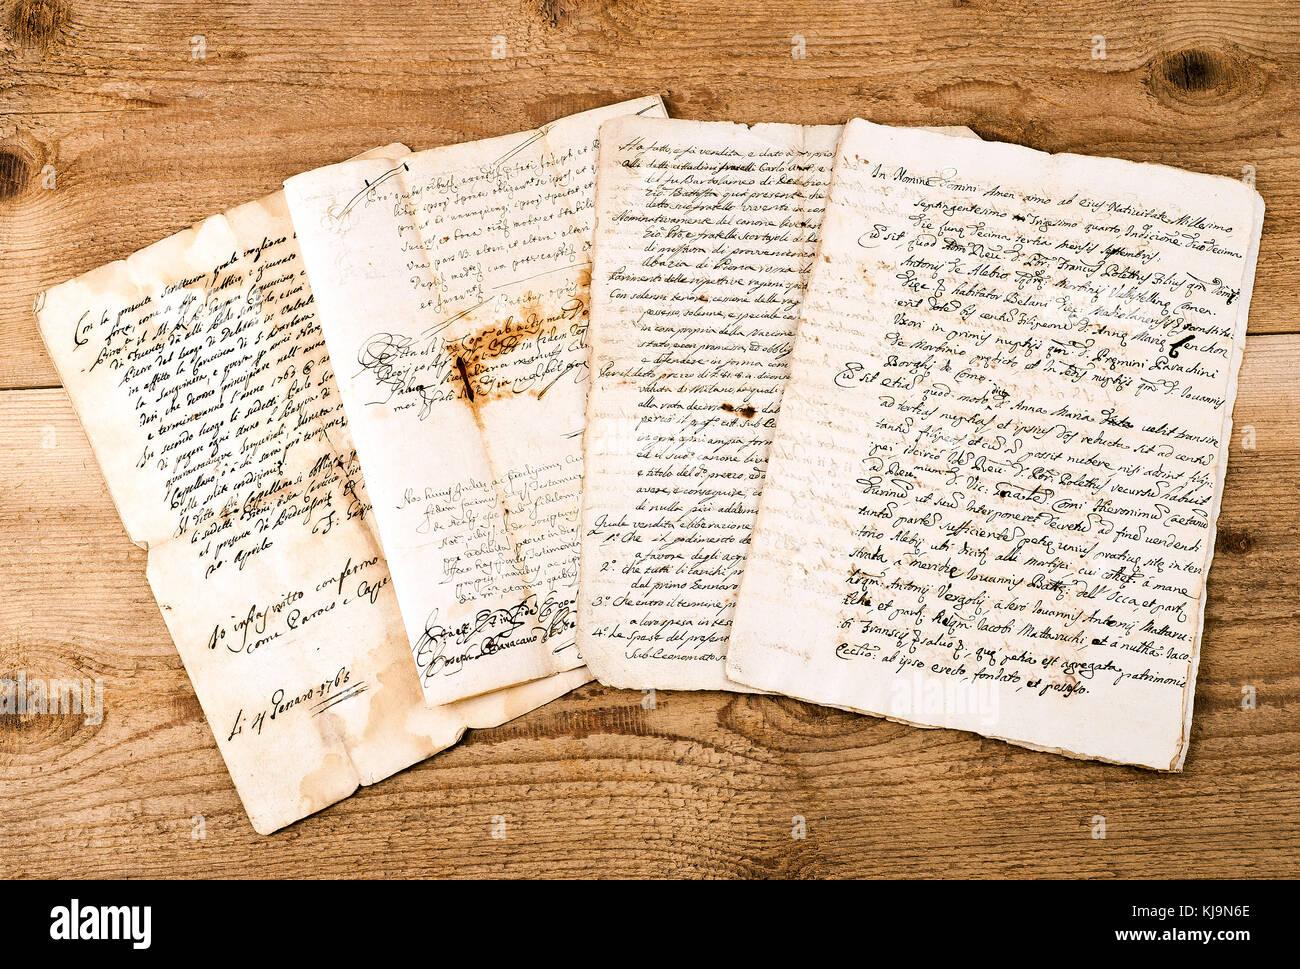 antique handwritings  on wood background - Stock Image